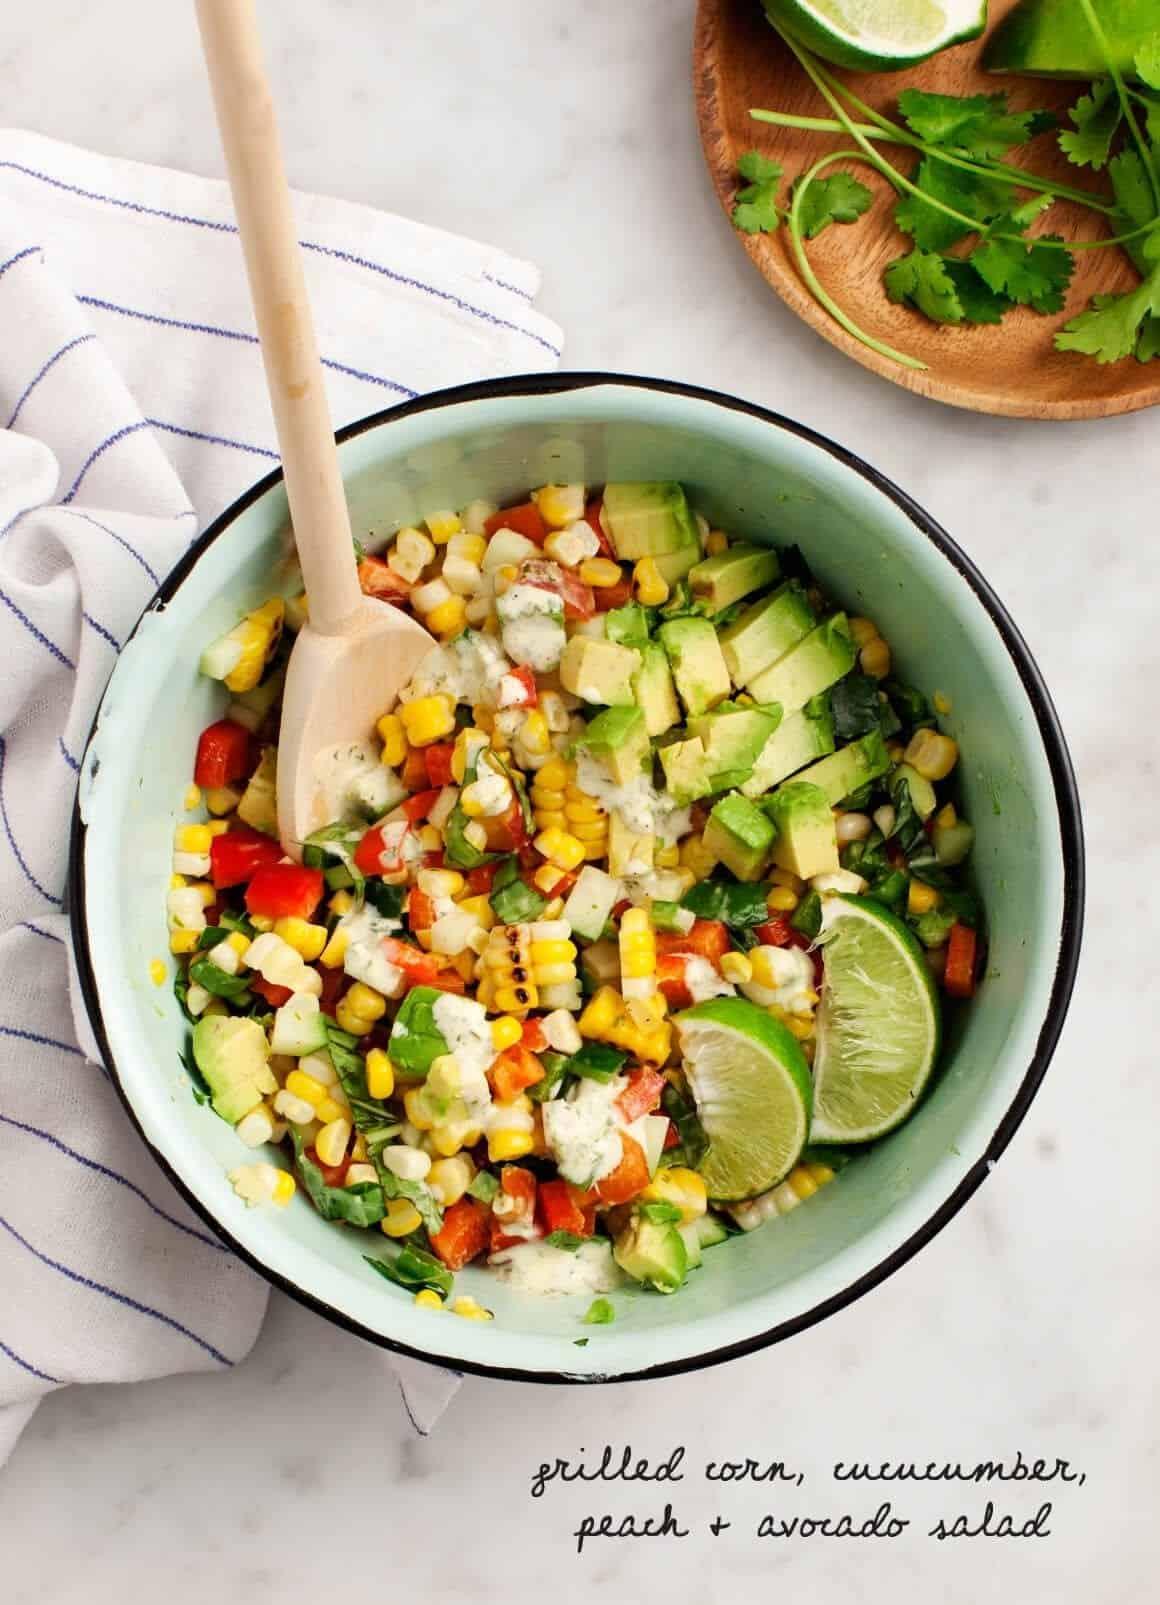 Corn Cucumber Peach Amp Avocado Salad Recipe Love And Lemons